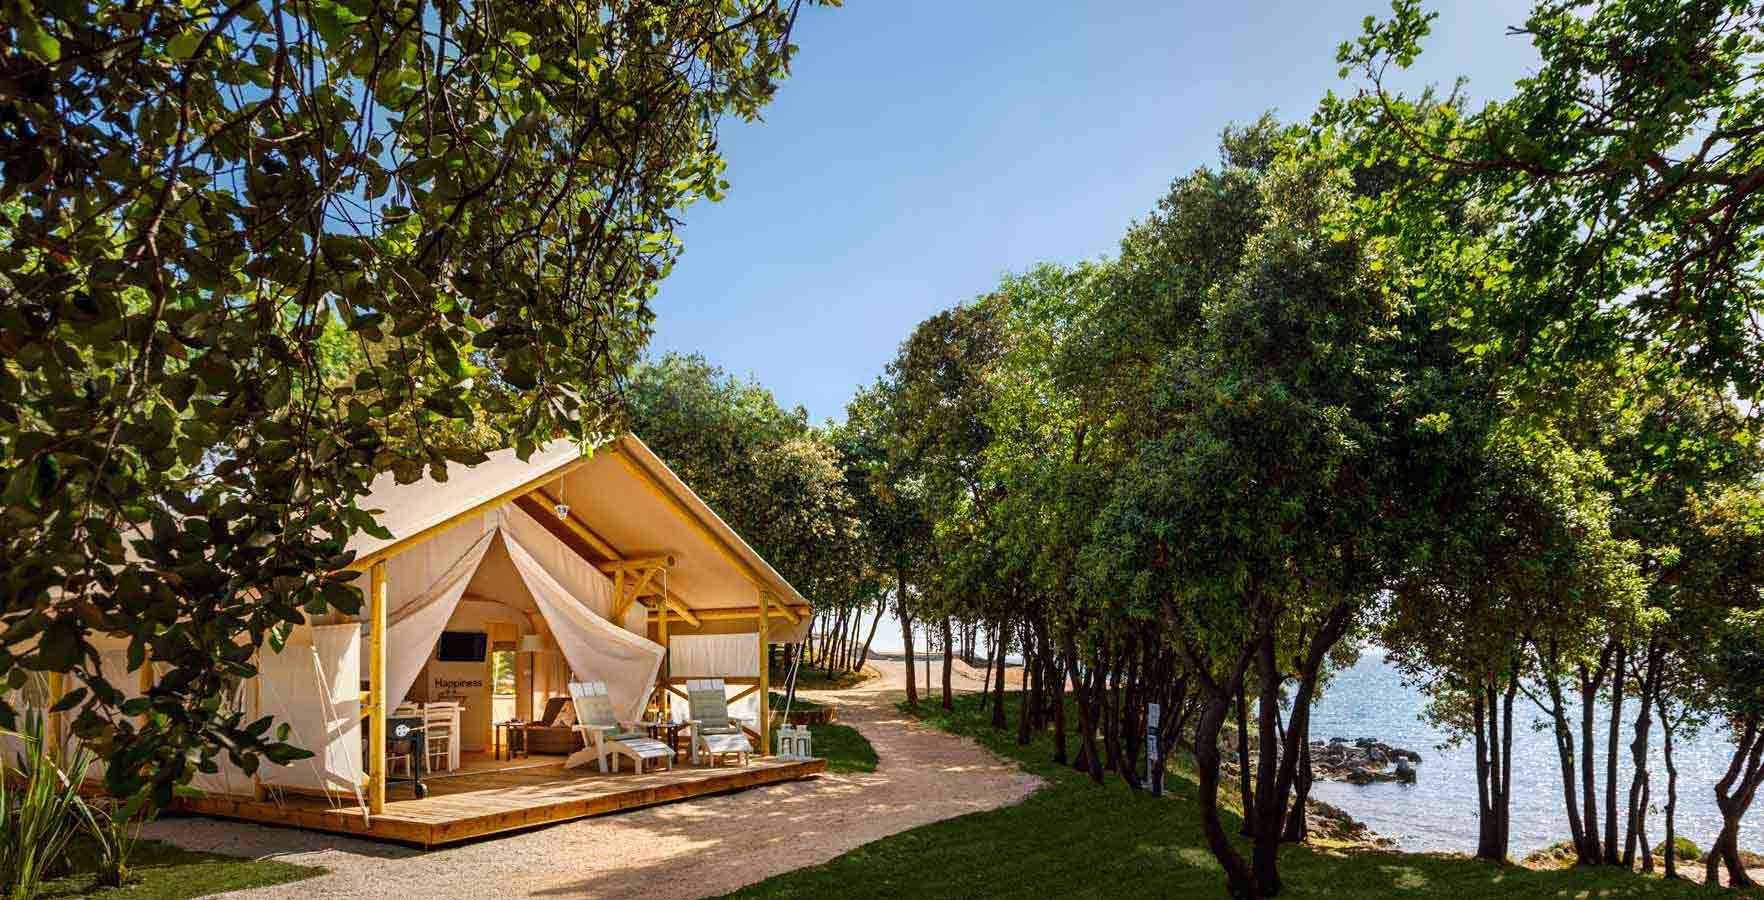 220-camp-istra-premium-camping-resort-glamping